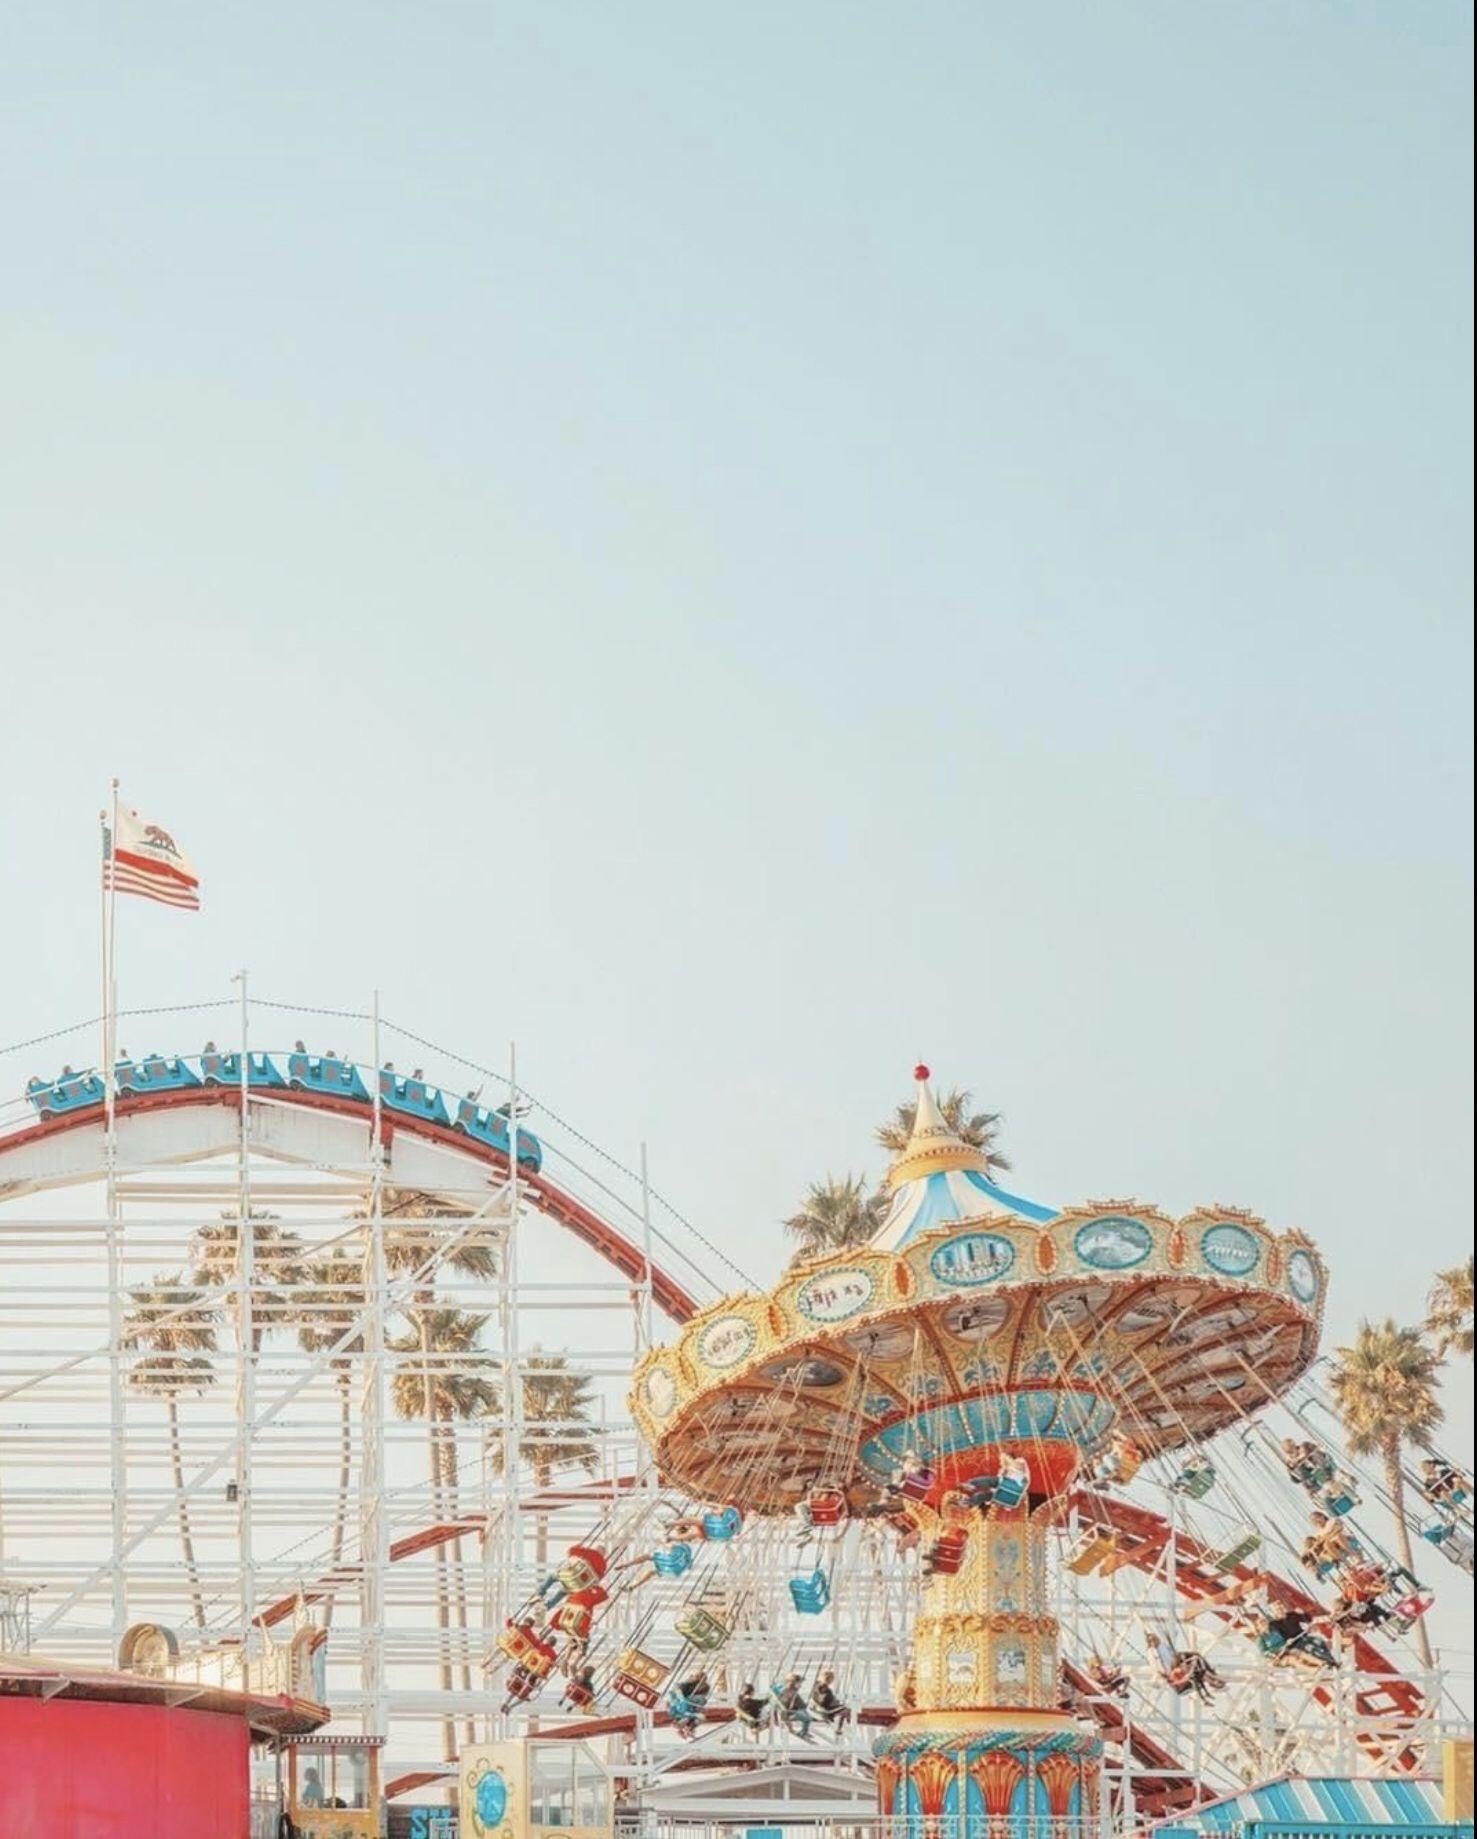 Santa Cruz Ca Beach And Boardwalk Photo Wall Collage Amusement Park Aesthetic Wallpapers